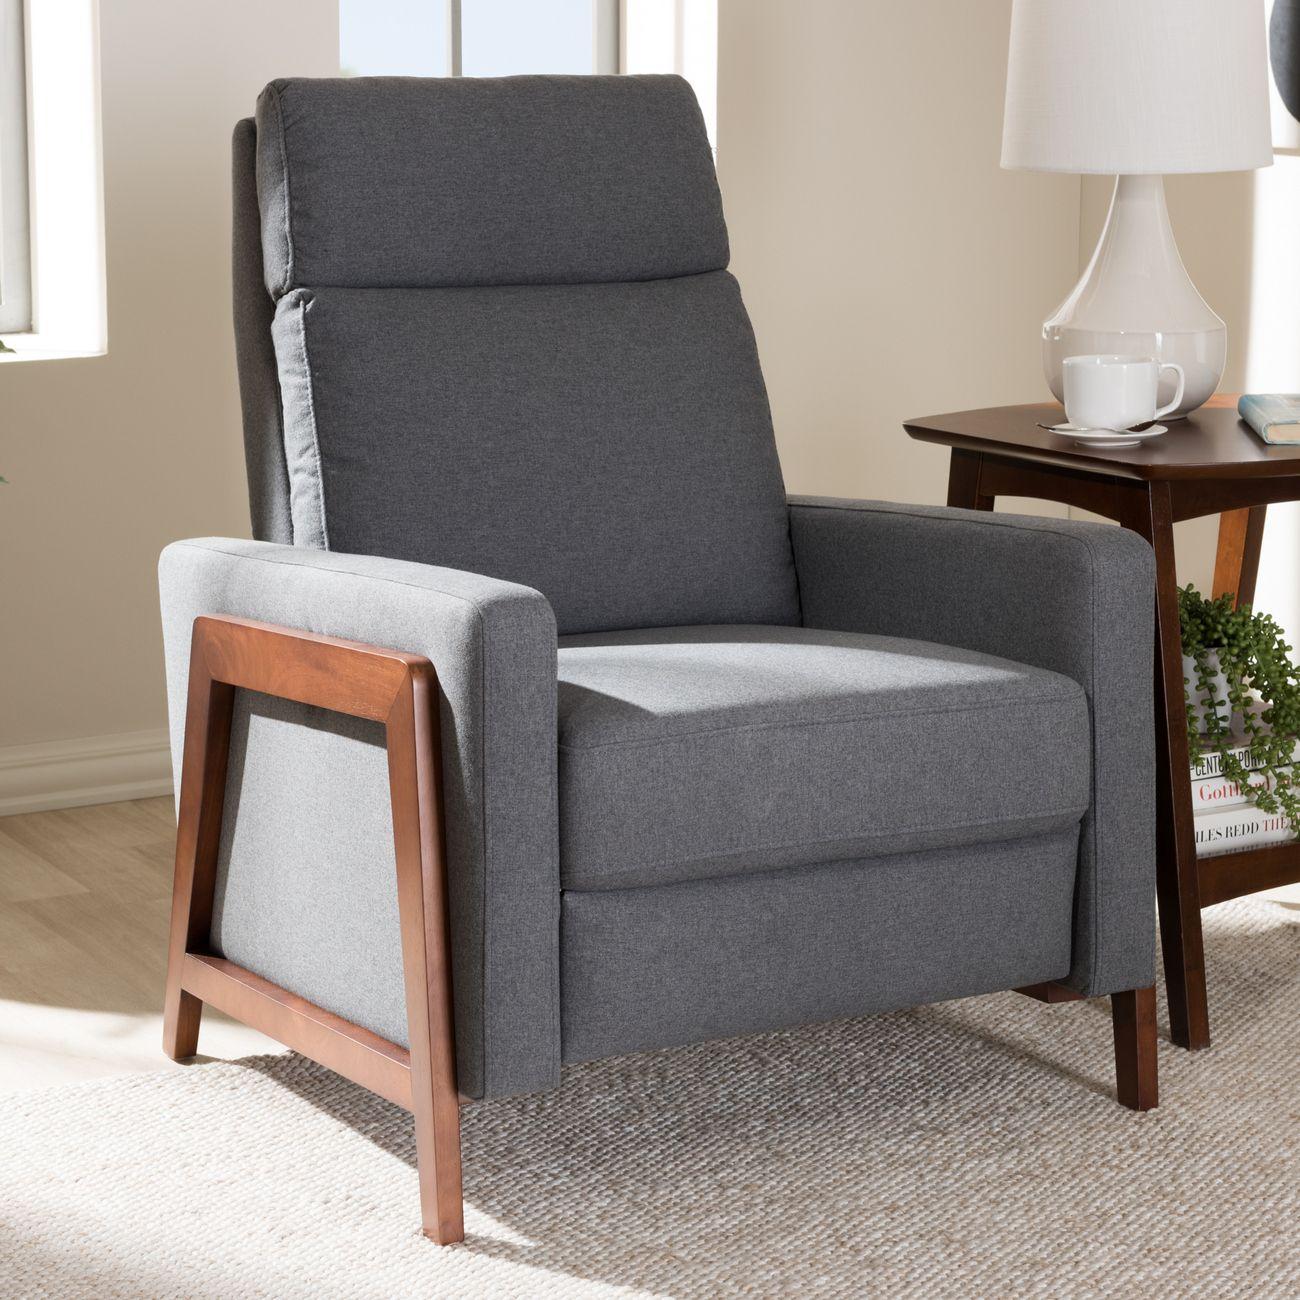 Baxton Studio Halstein Mid Century Modern Grey Fabric Upholstered Lounge Chair 1706 Gray